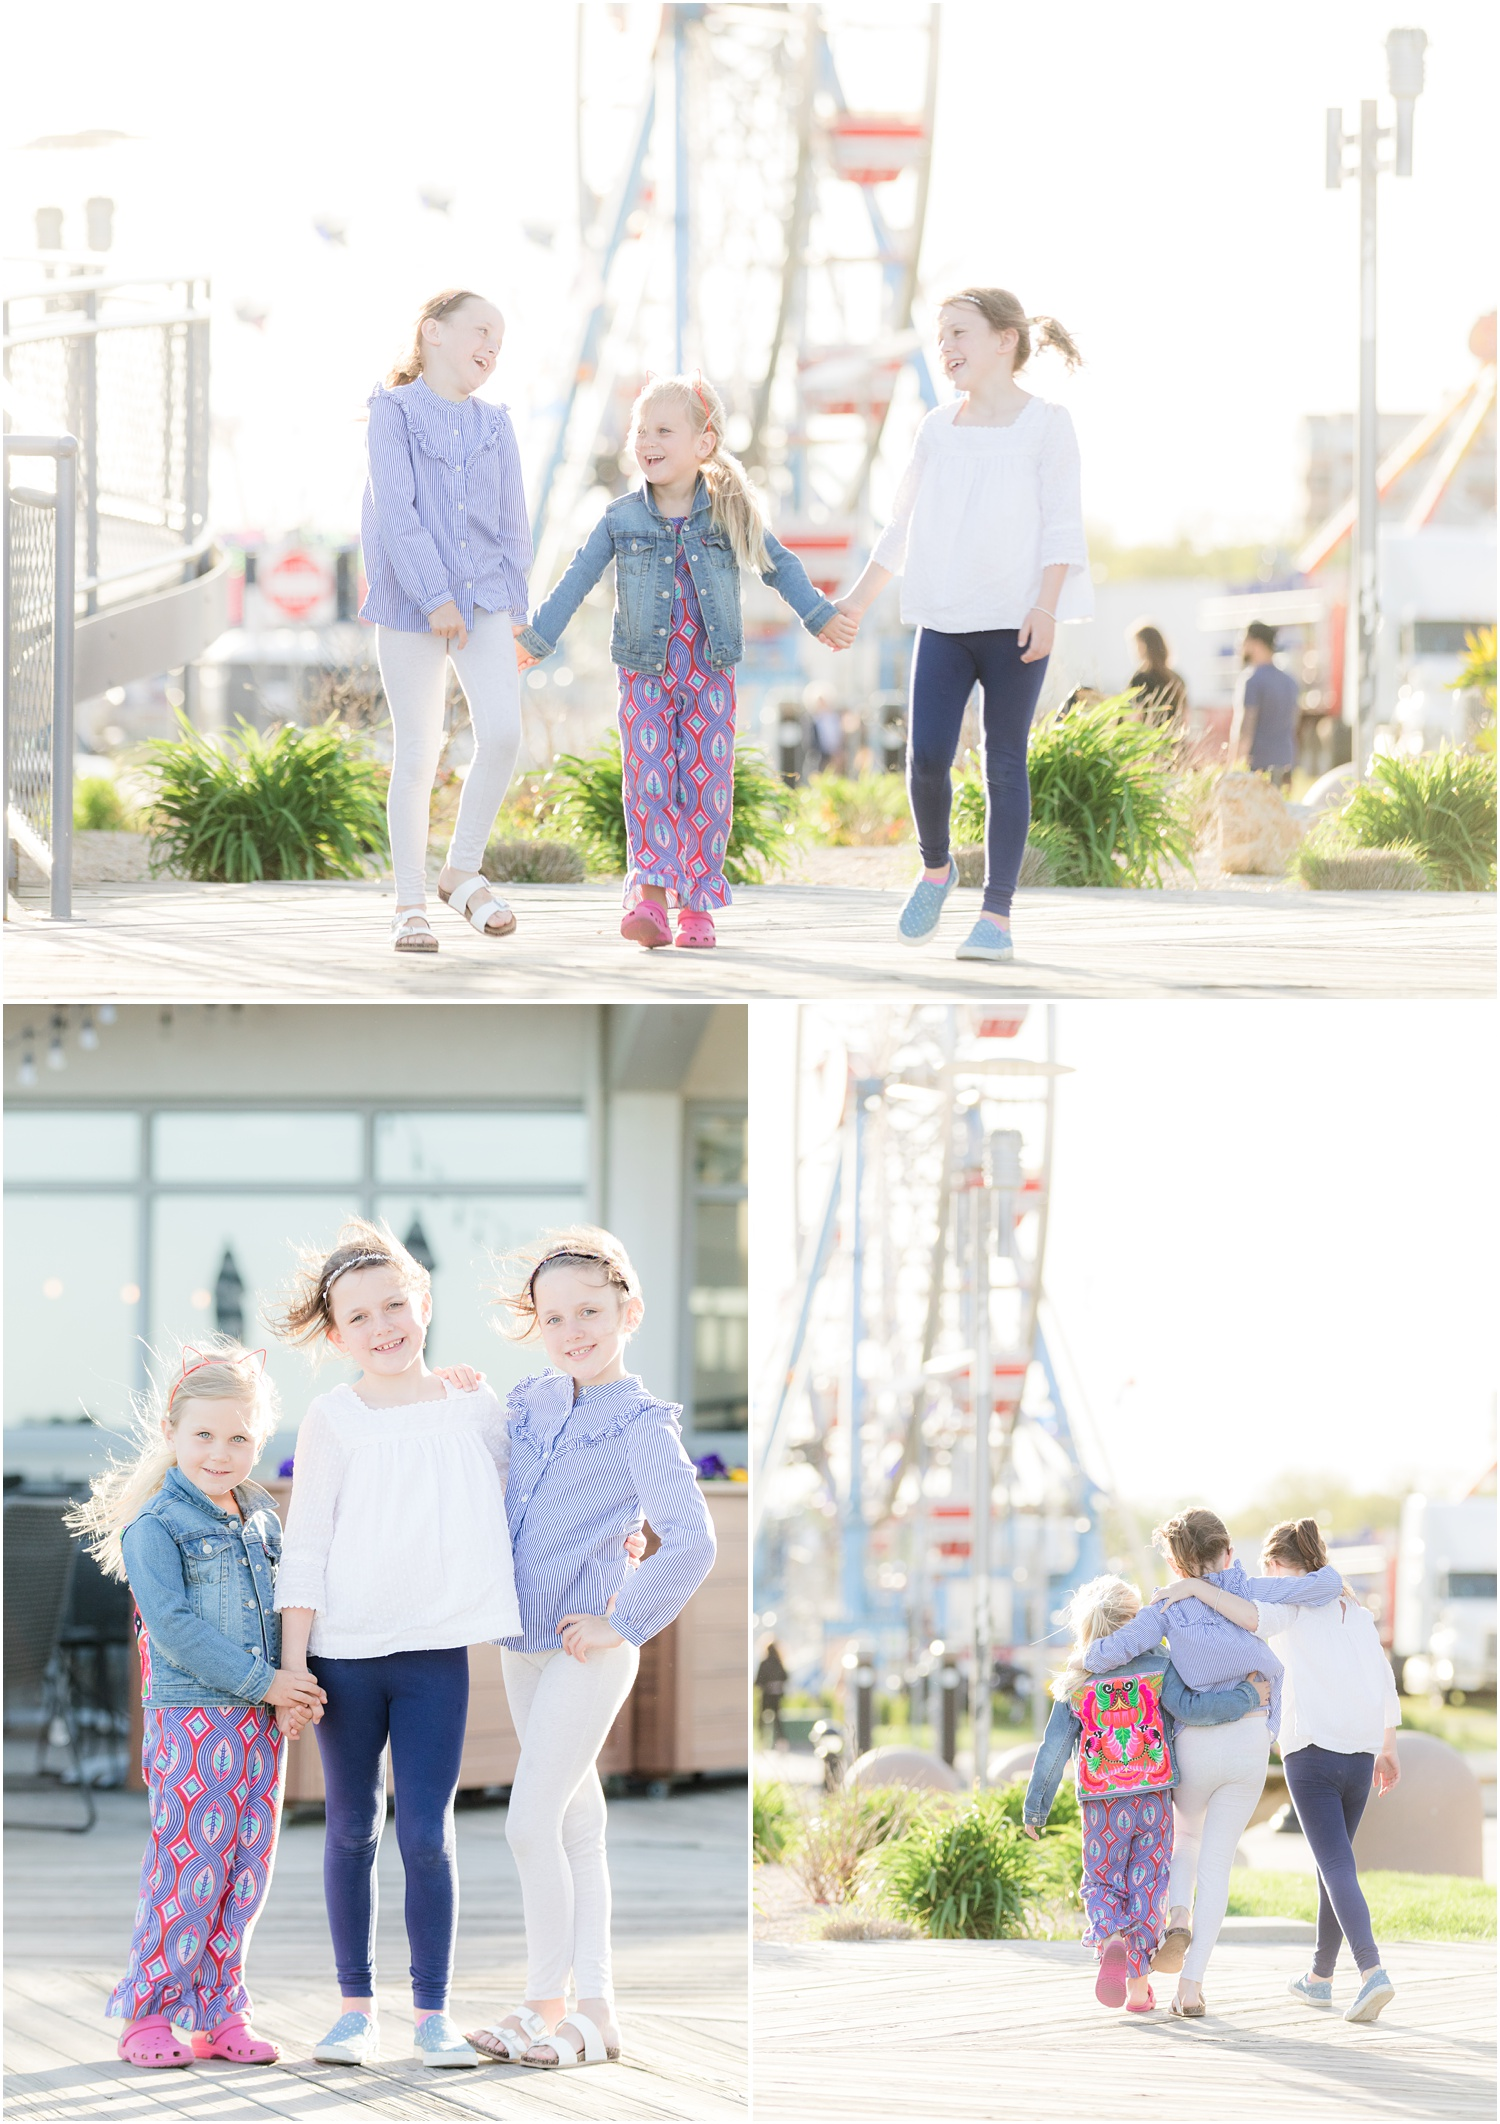 3 sisters having fun at the fair ferris wheel in Asbury Park